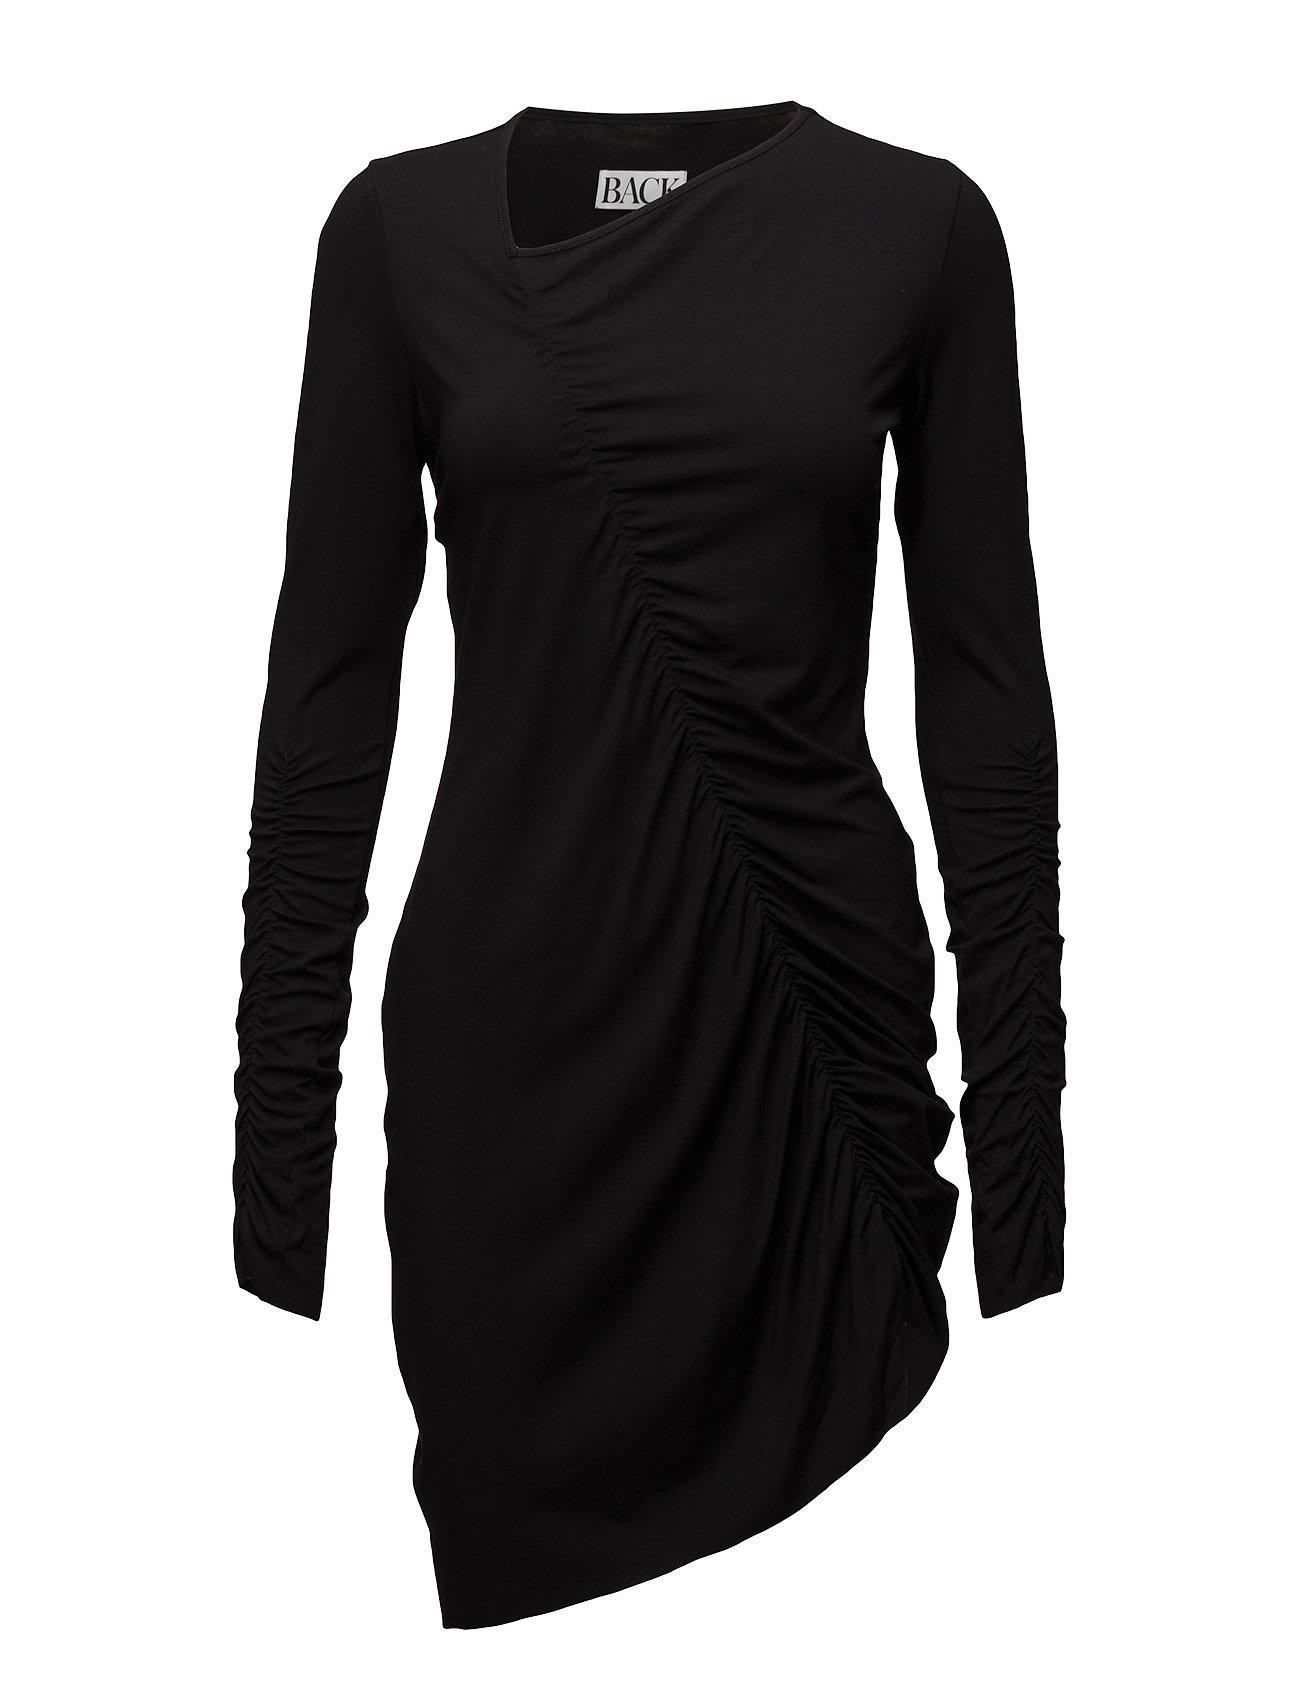 Gather Dress Jersey BACK Korte kjoler til Damer i Sort